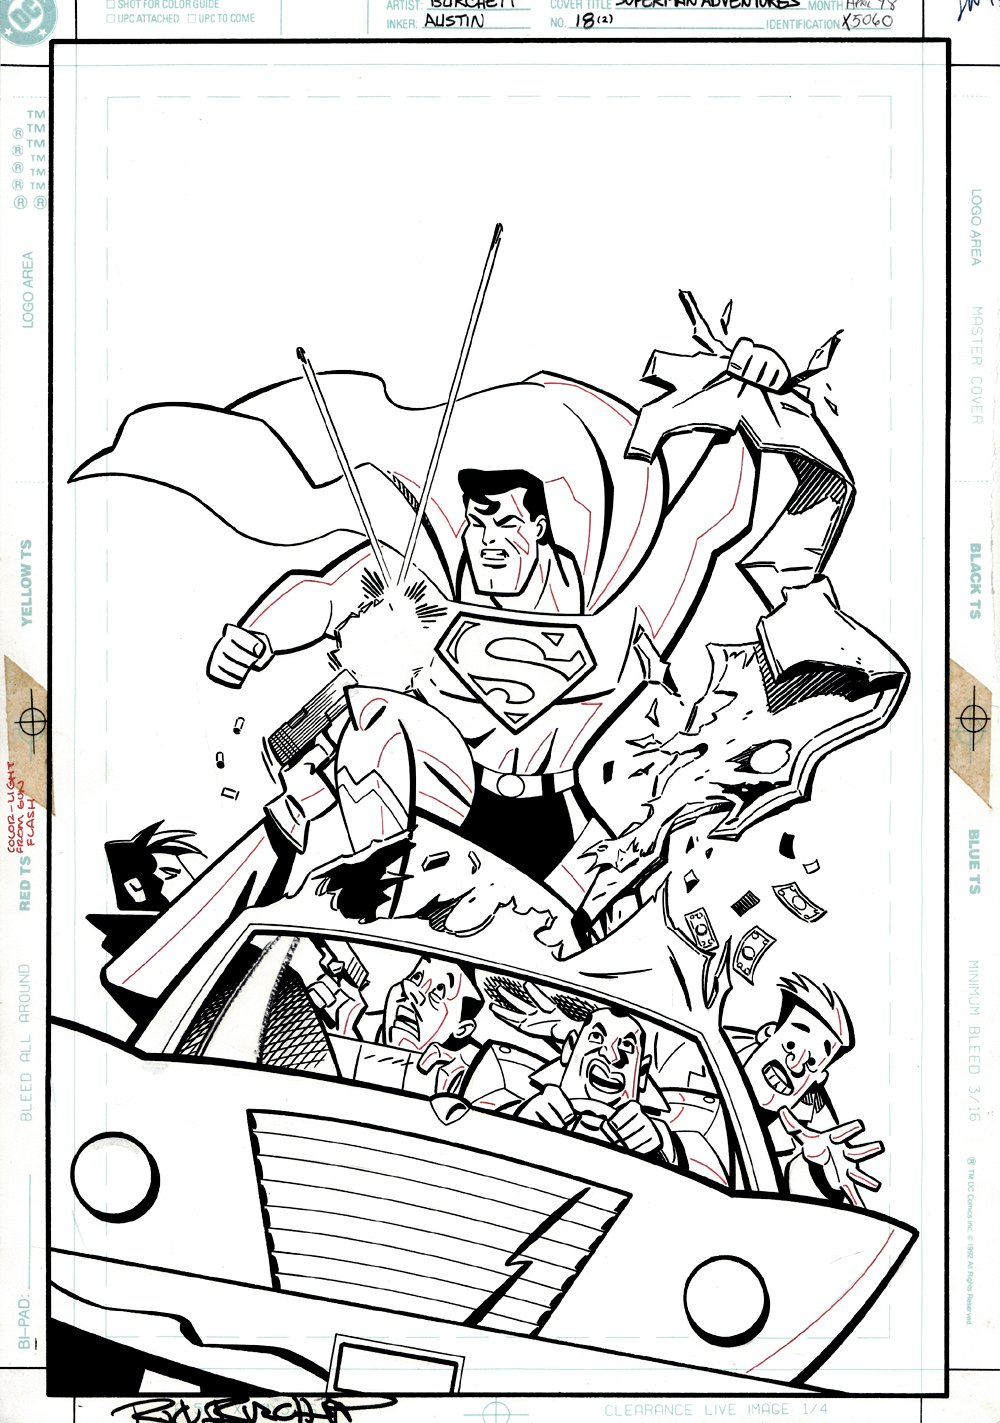 Superman Adventures #18 Cover (ICONIC SUPERMAN BATTLE SCENE!) 1998